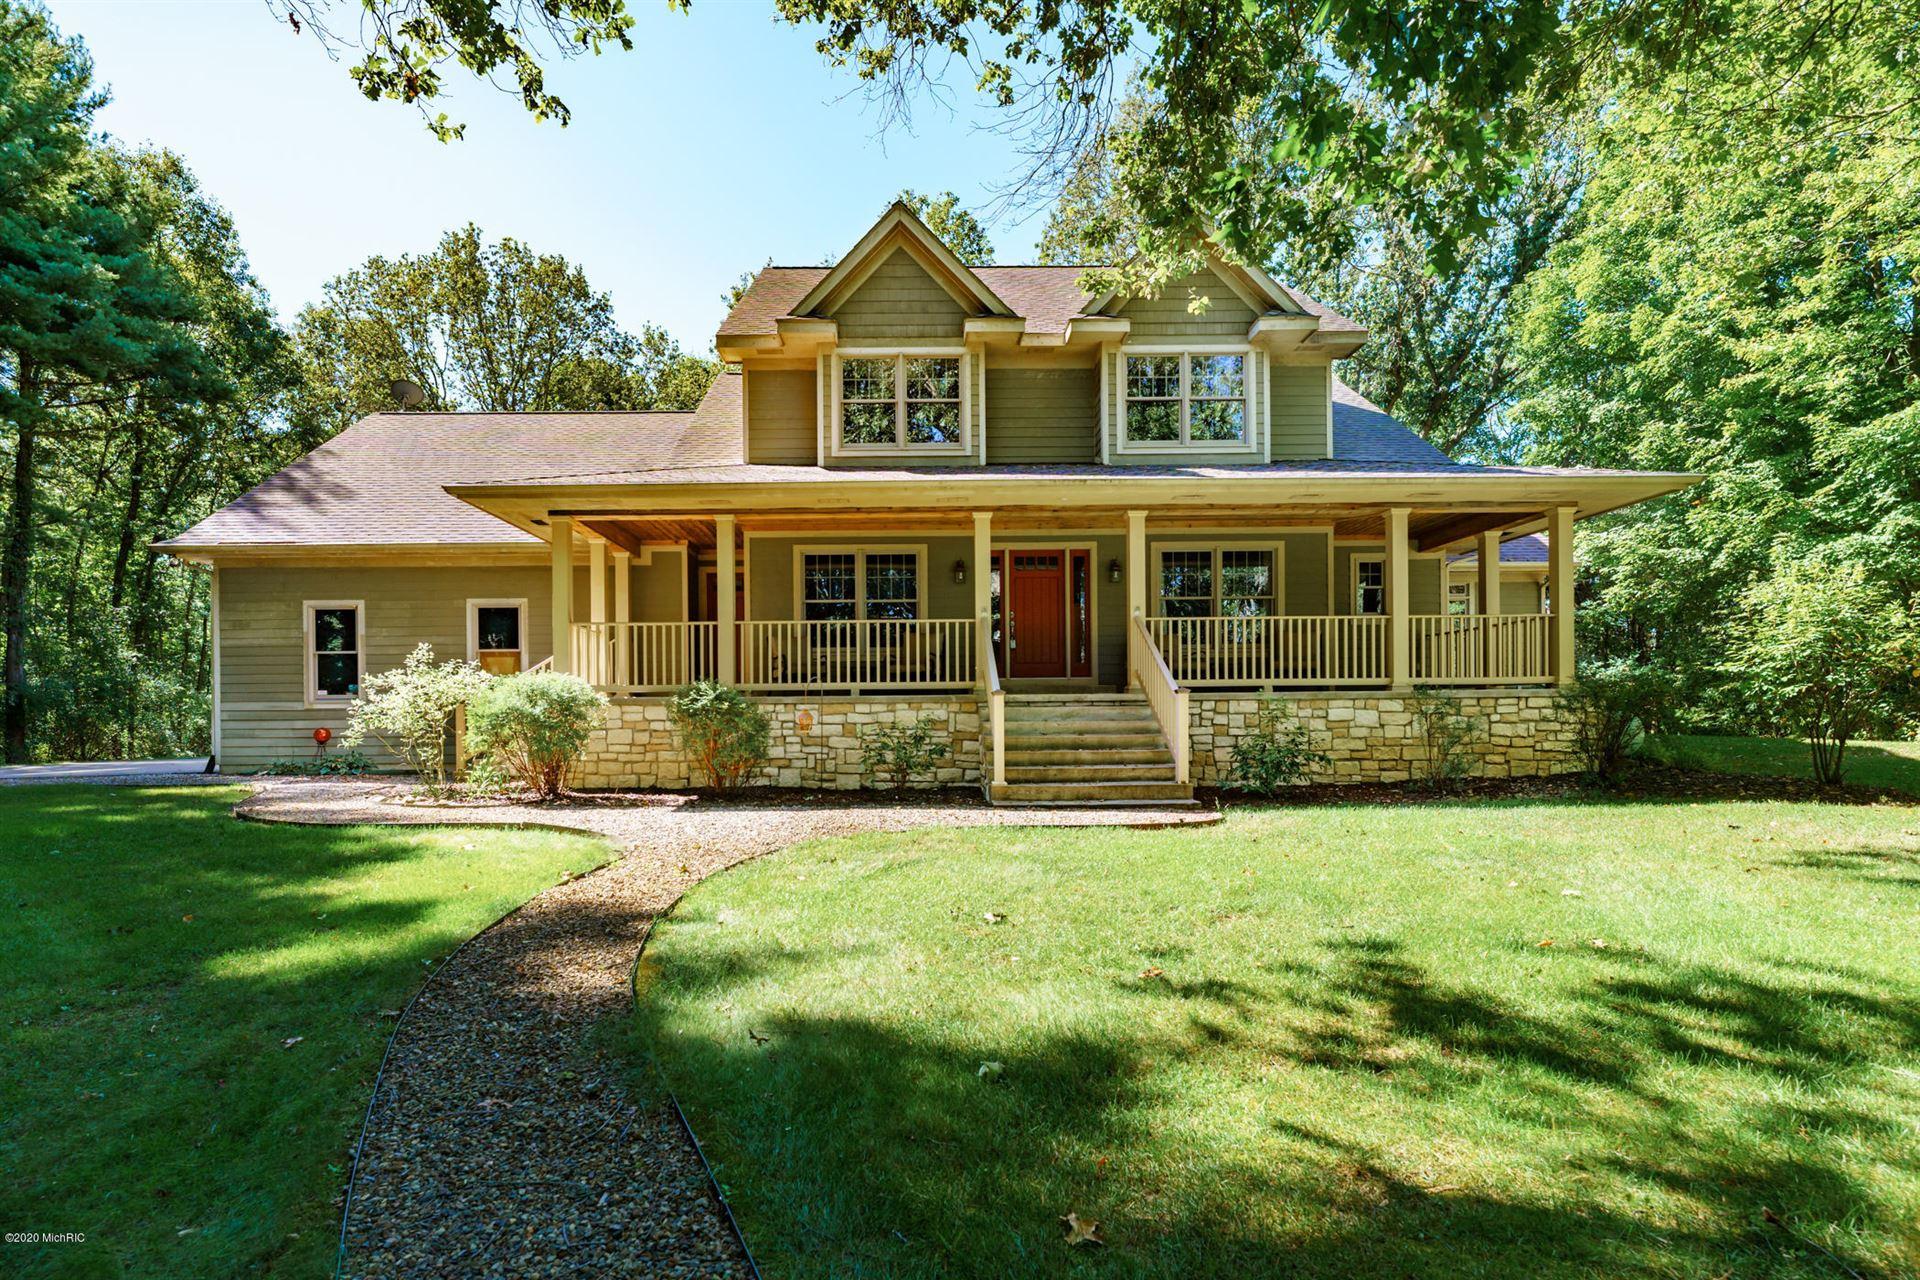 9275 Highland View Drive, Kalamazoo, MI 49009 - MLS#: 20036092